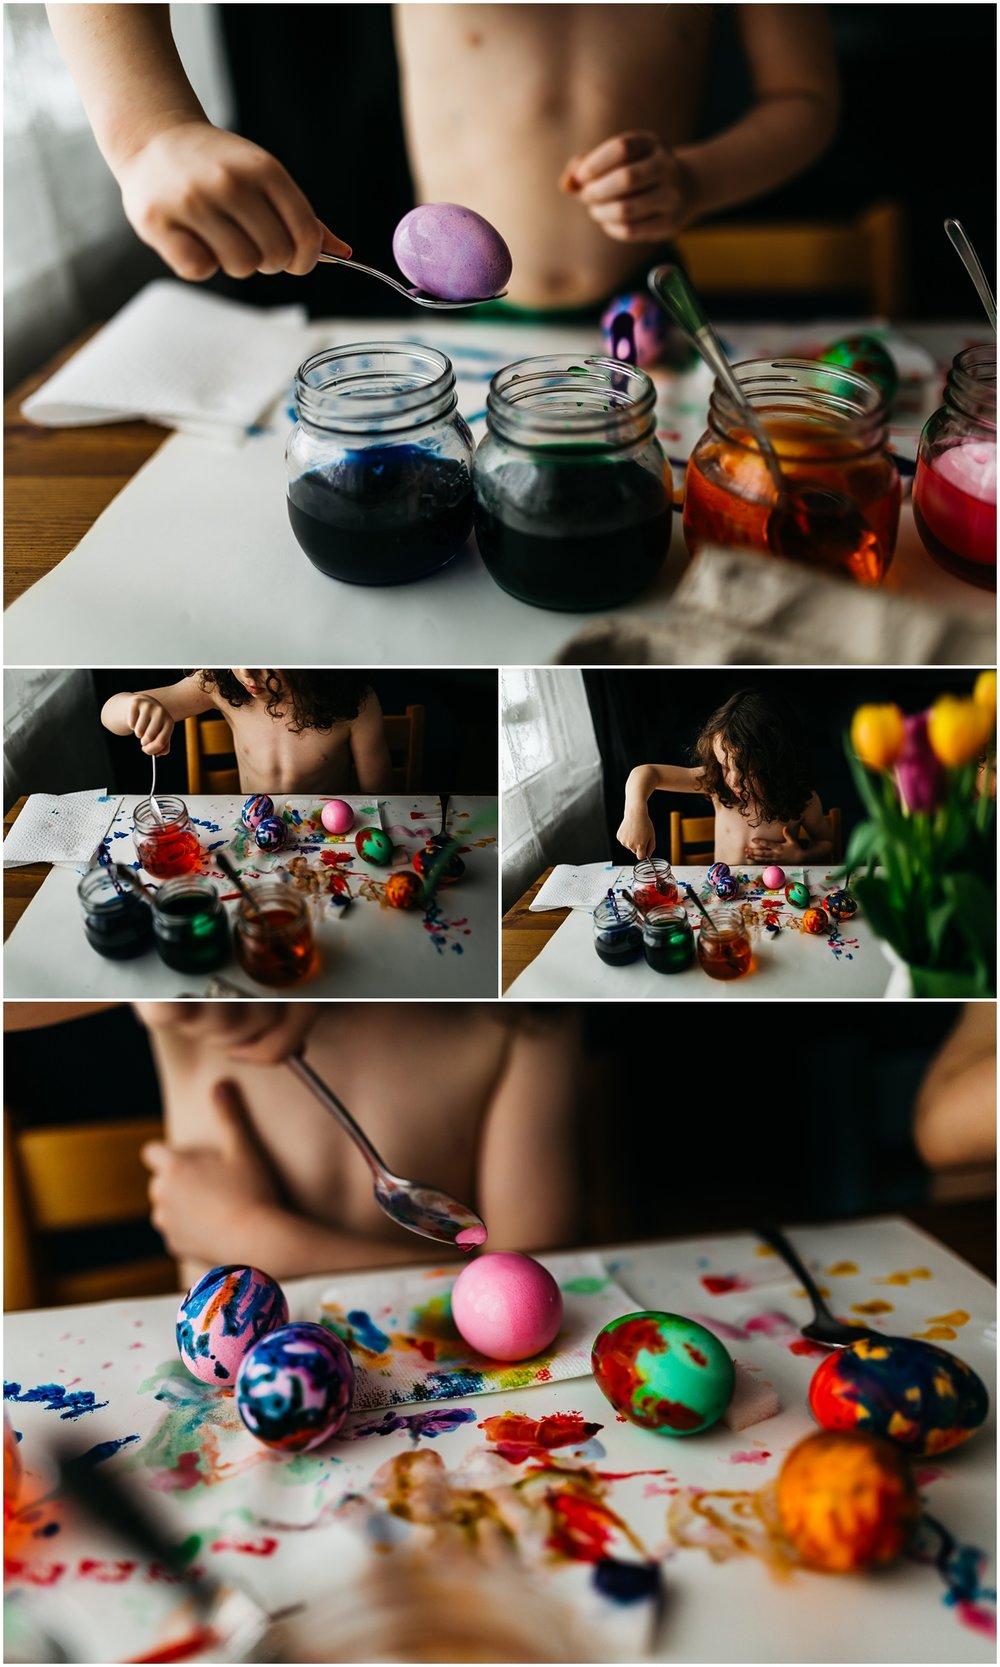 Easter Egg Painting - Edmonton Photographer - Edmonton Family Photographer -  Easter Eggs - Easter 2018 - Crayons on Easter Eggs - Edmonton Documentary Photographer - Family Photography - Documentary Photography - Tulips - Purple Eggs - Pass Easter Kits